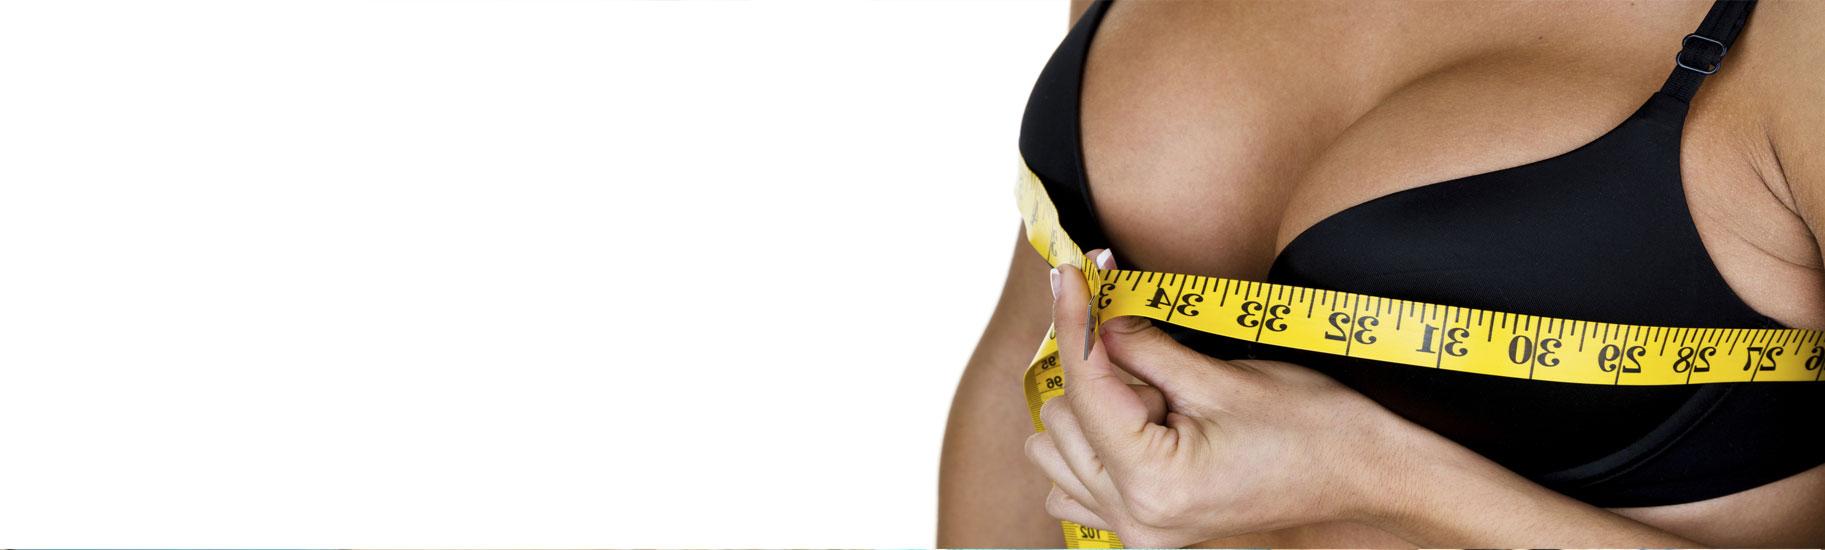 Polyurethane or Furry Brazilian Breast Implants Sydney I.